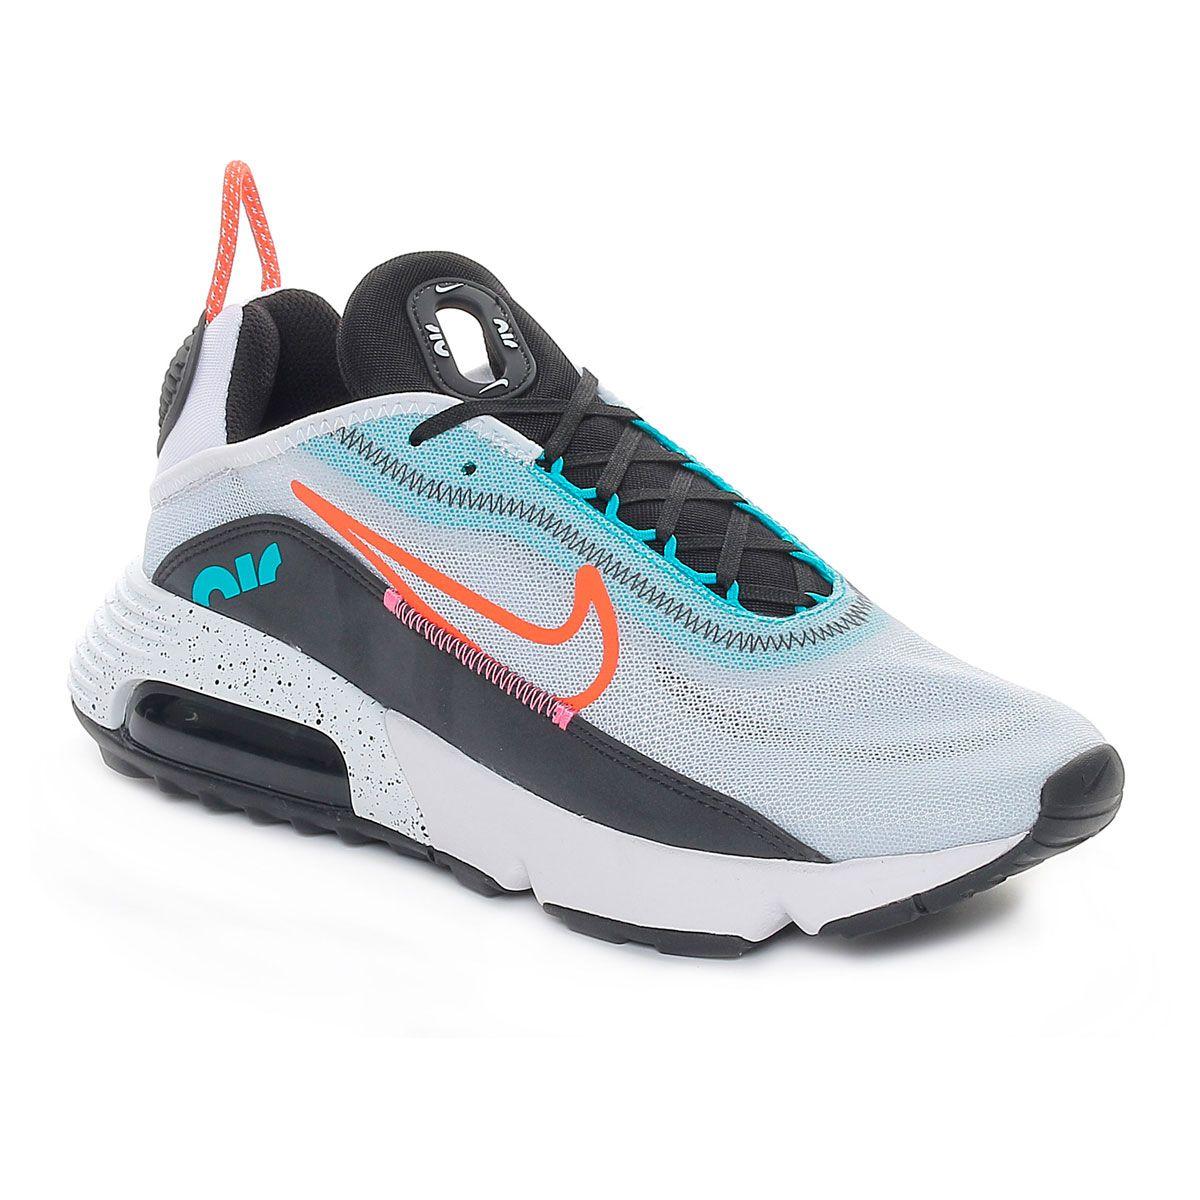 Nike Air Max 2090 Uomo Bianco Arancione